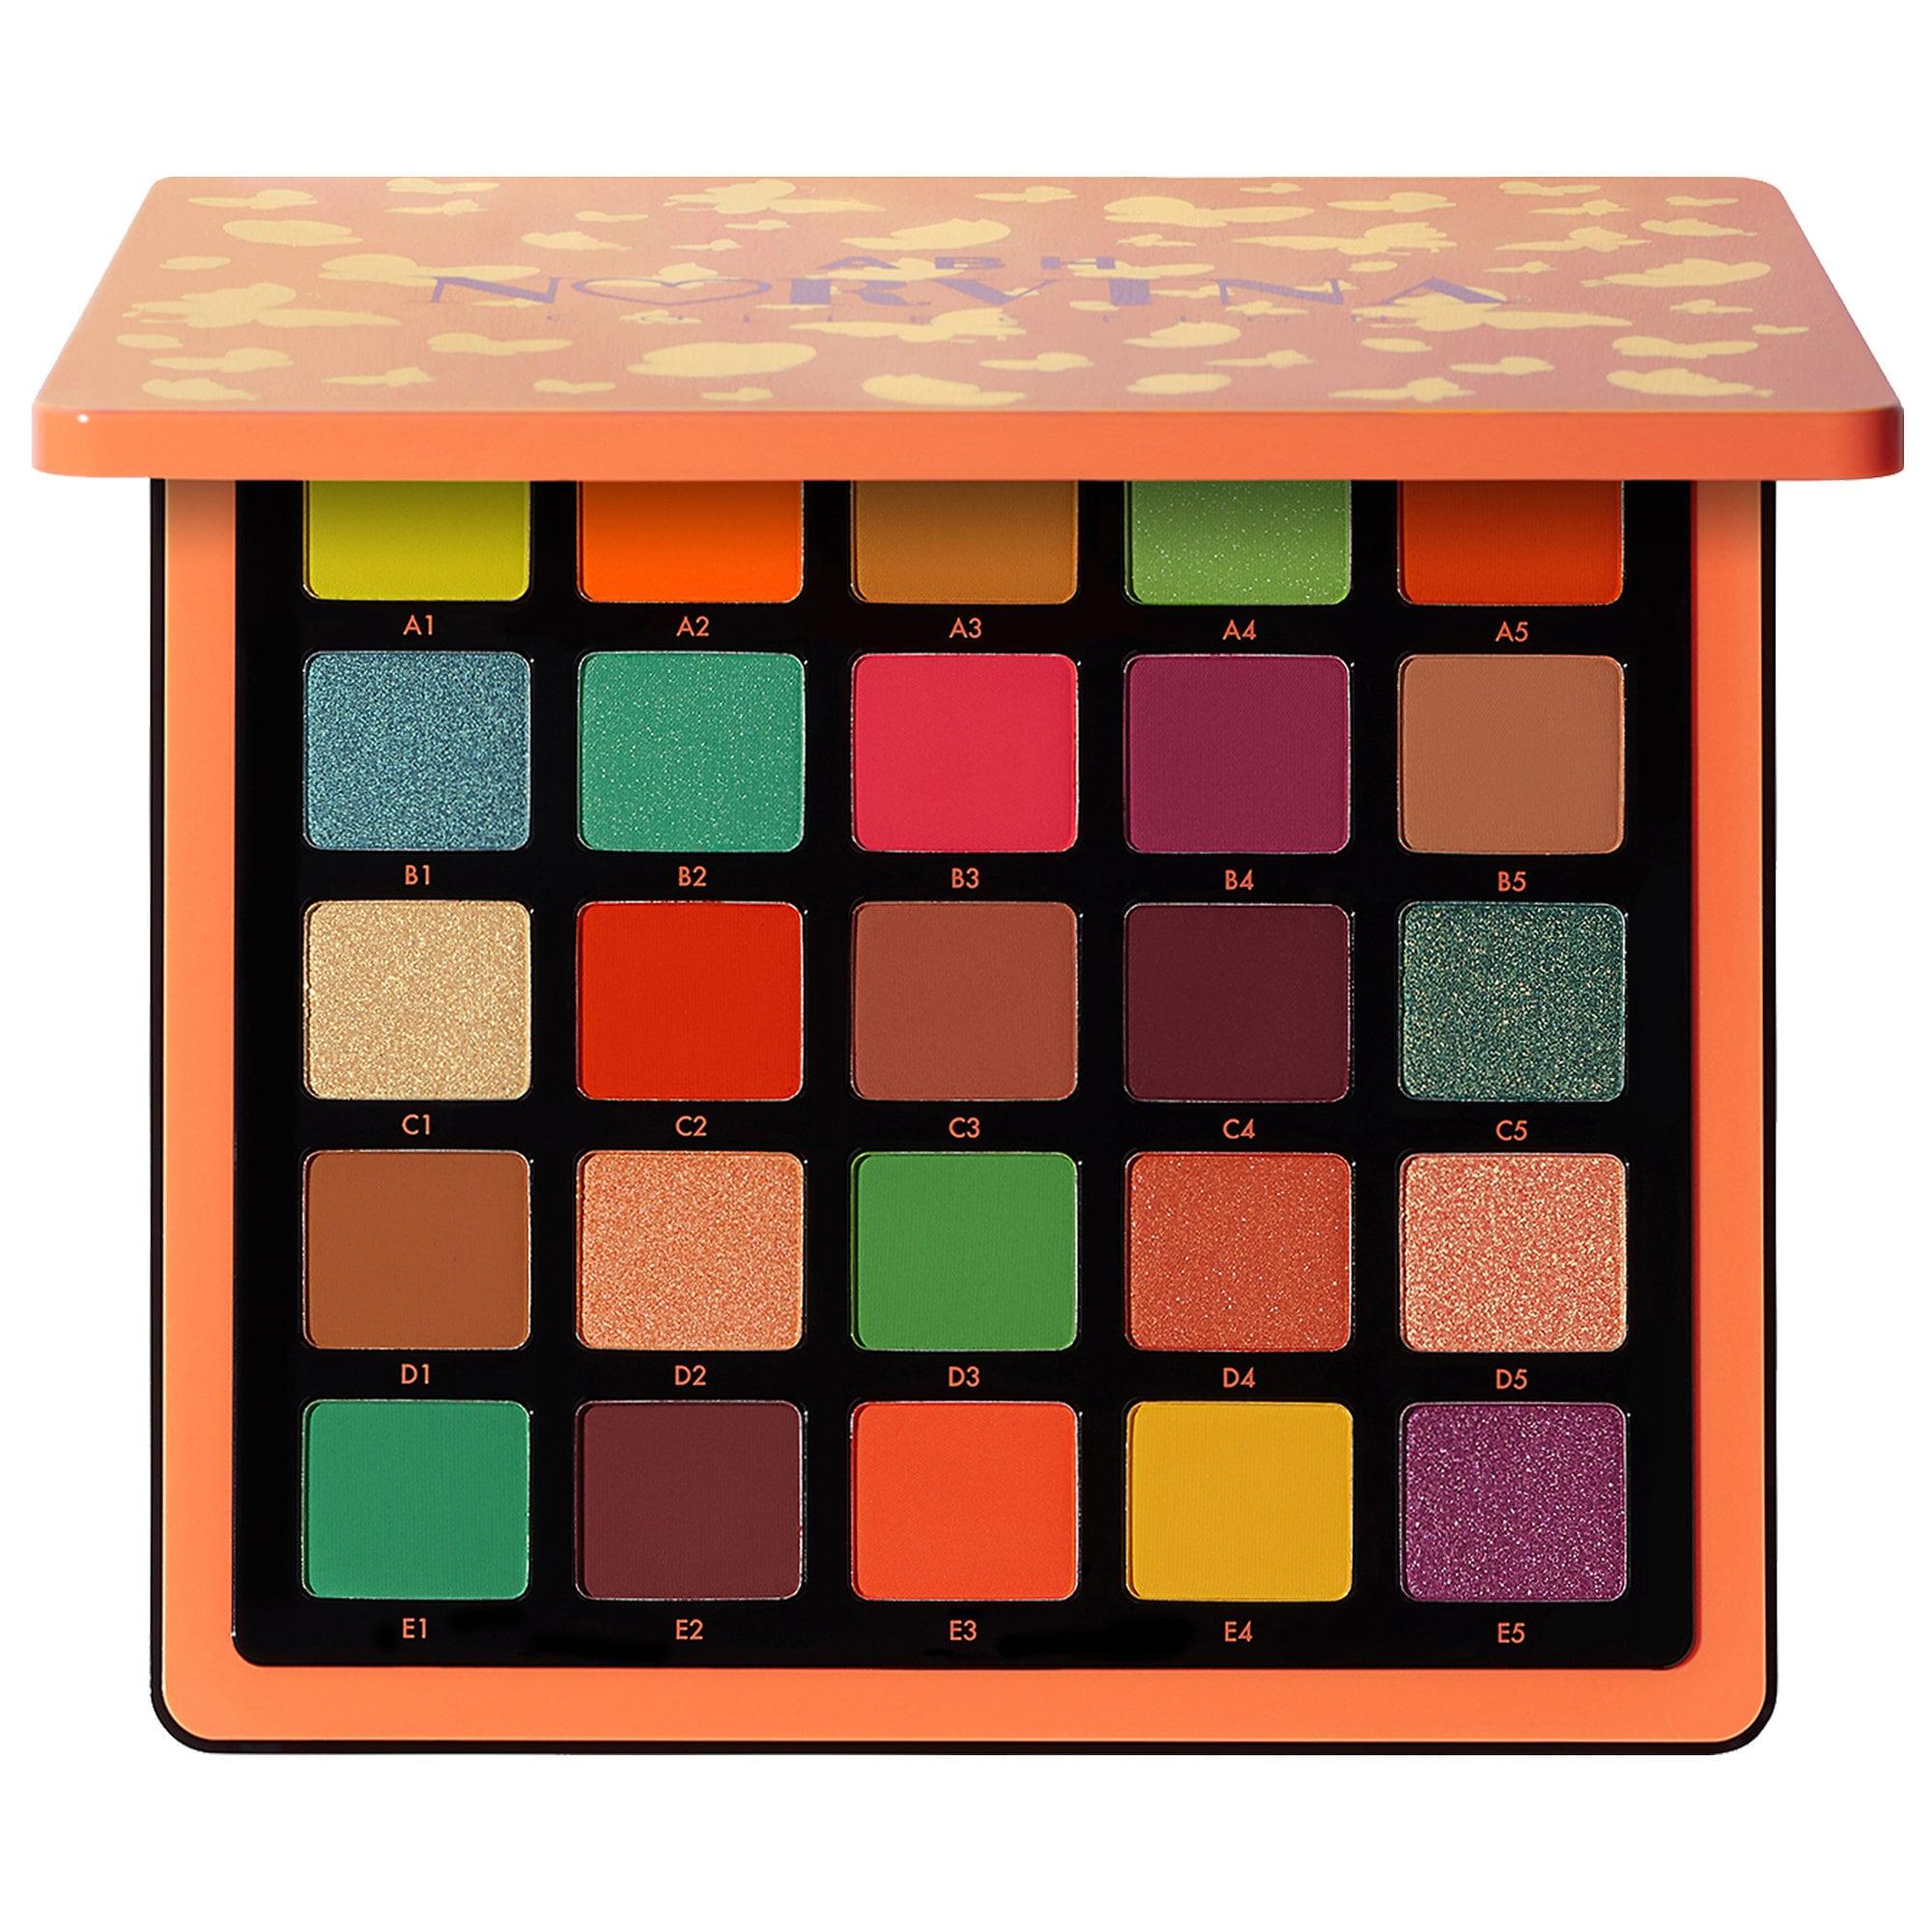 Anastasia Beverly Hills Norvina® Pro Pigment Palette Vol. 3